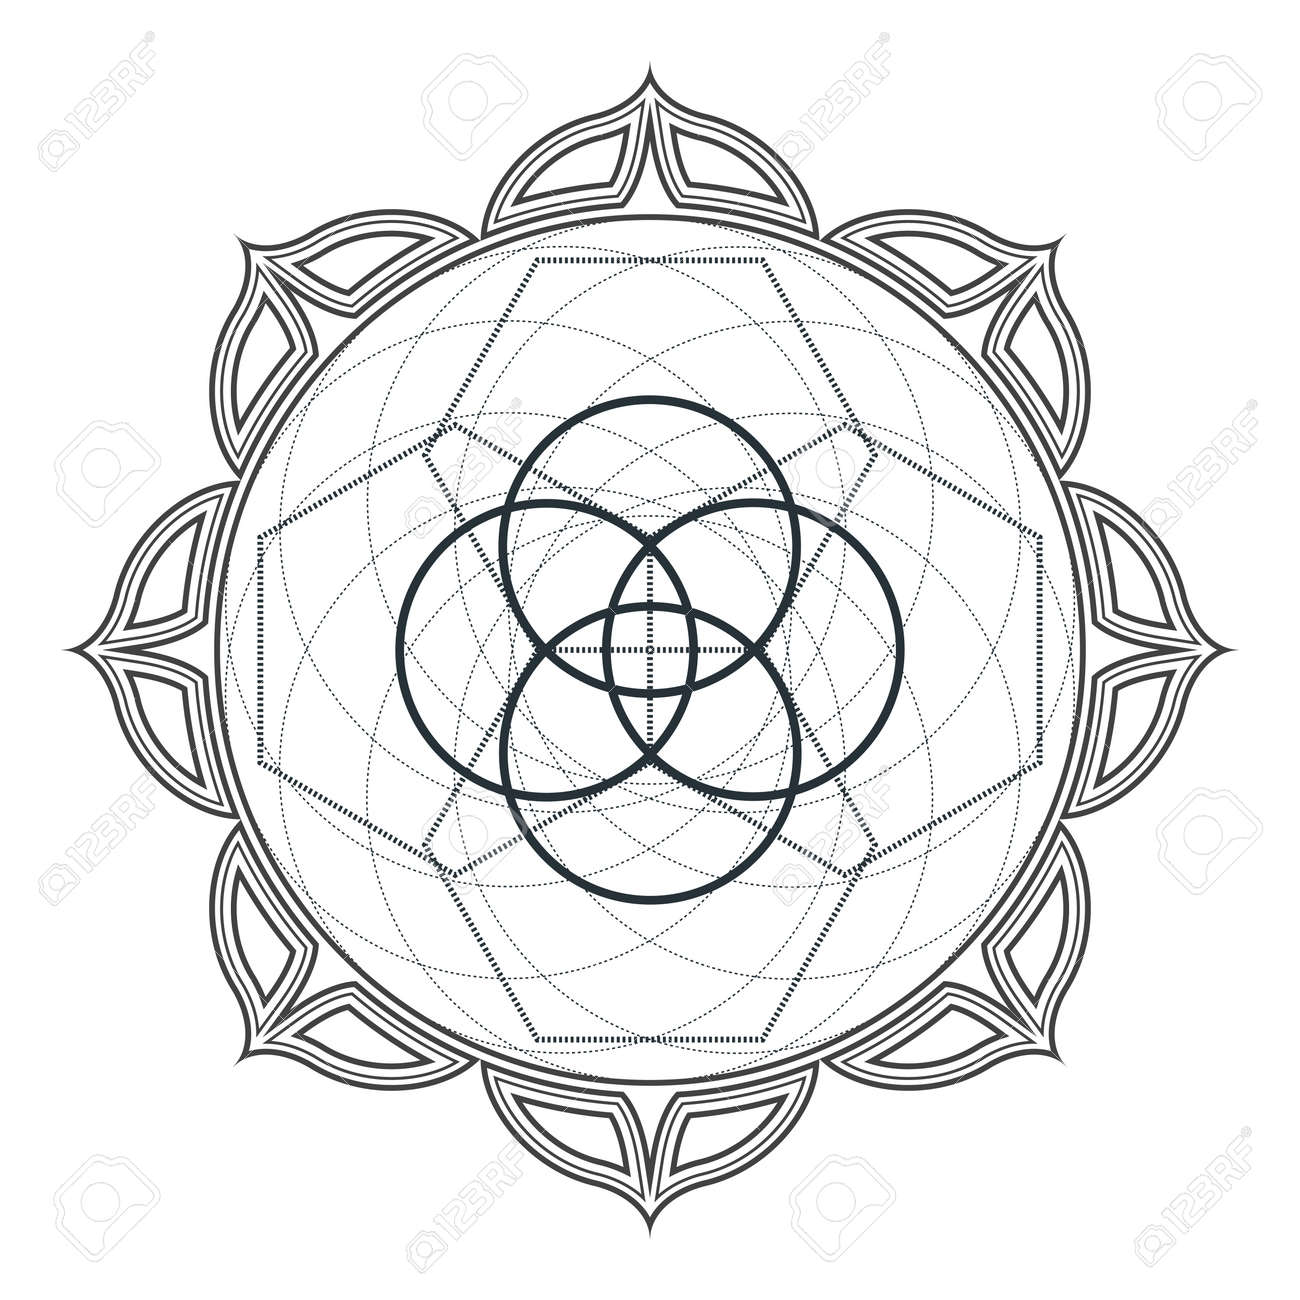 vector contour monochrome design mandala sacred geometry illustration